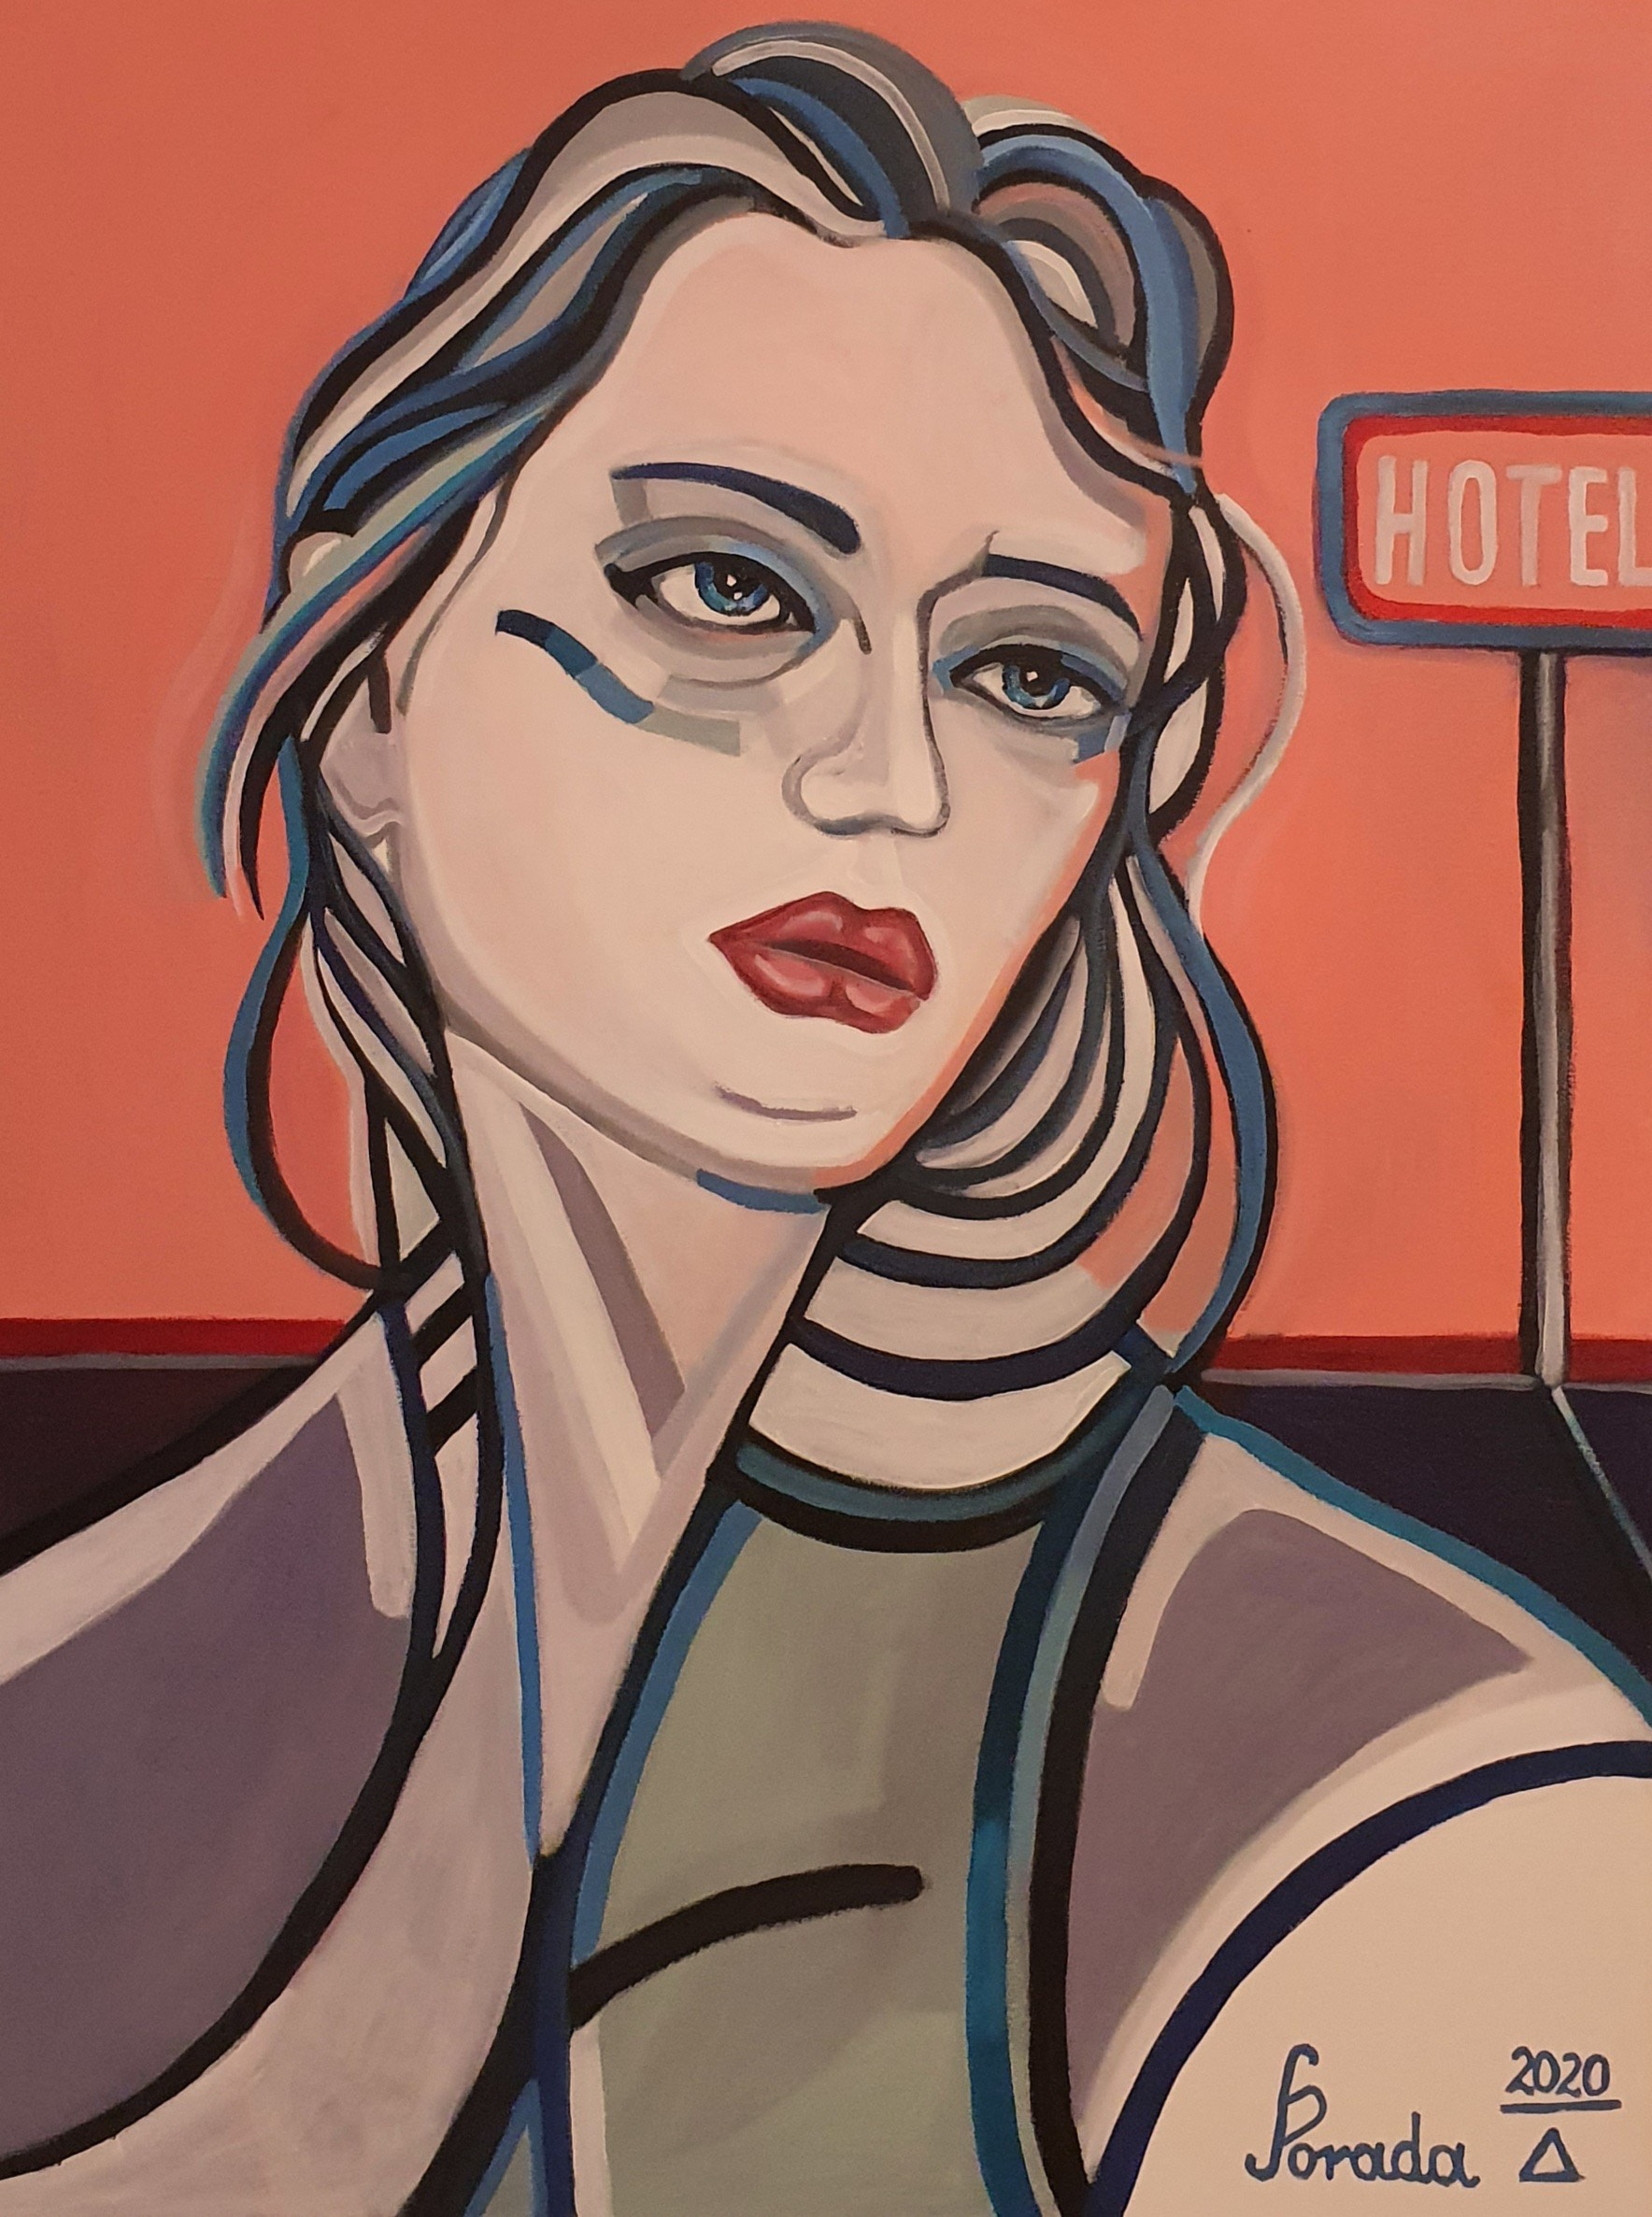 Hotel, 2020